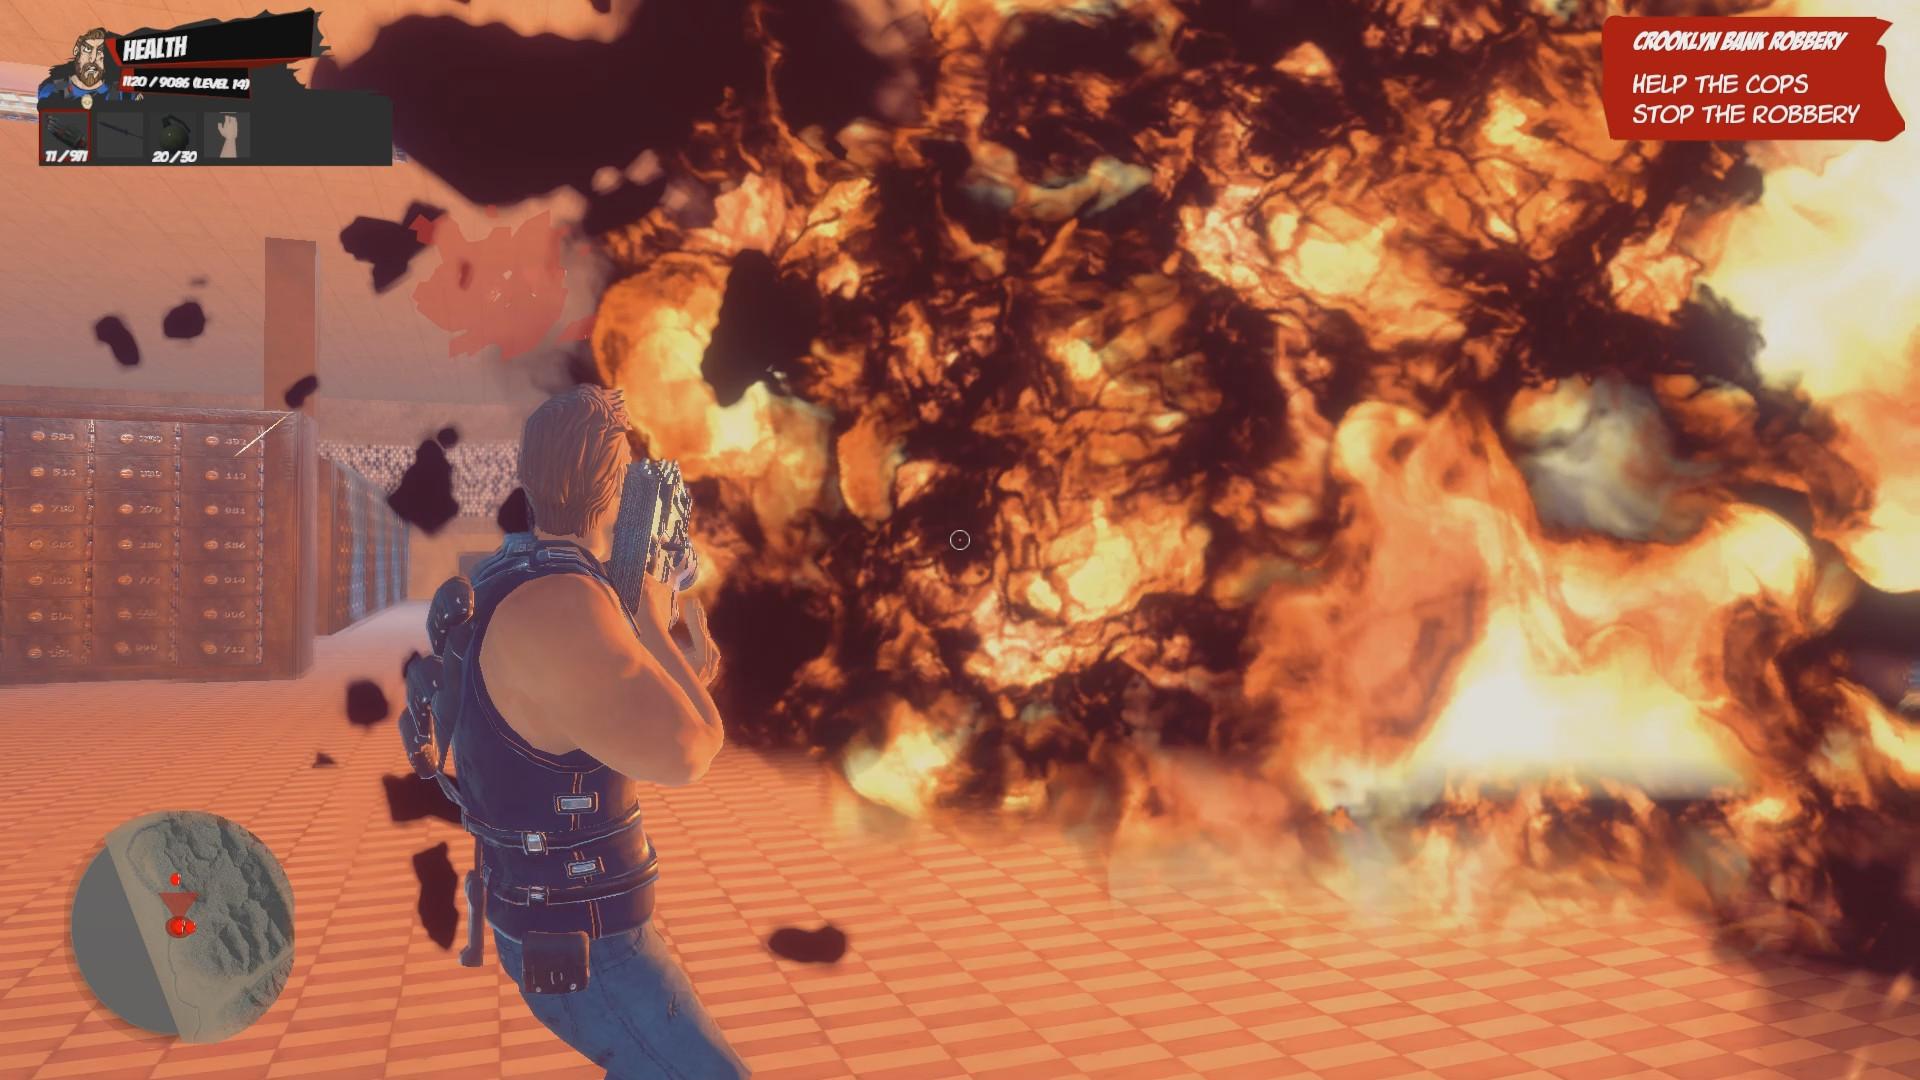 [Image: Fire.jpg]